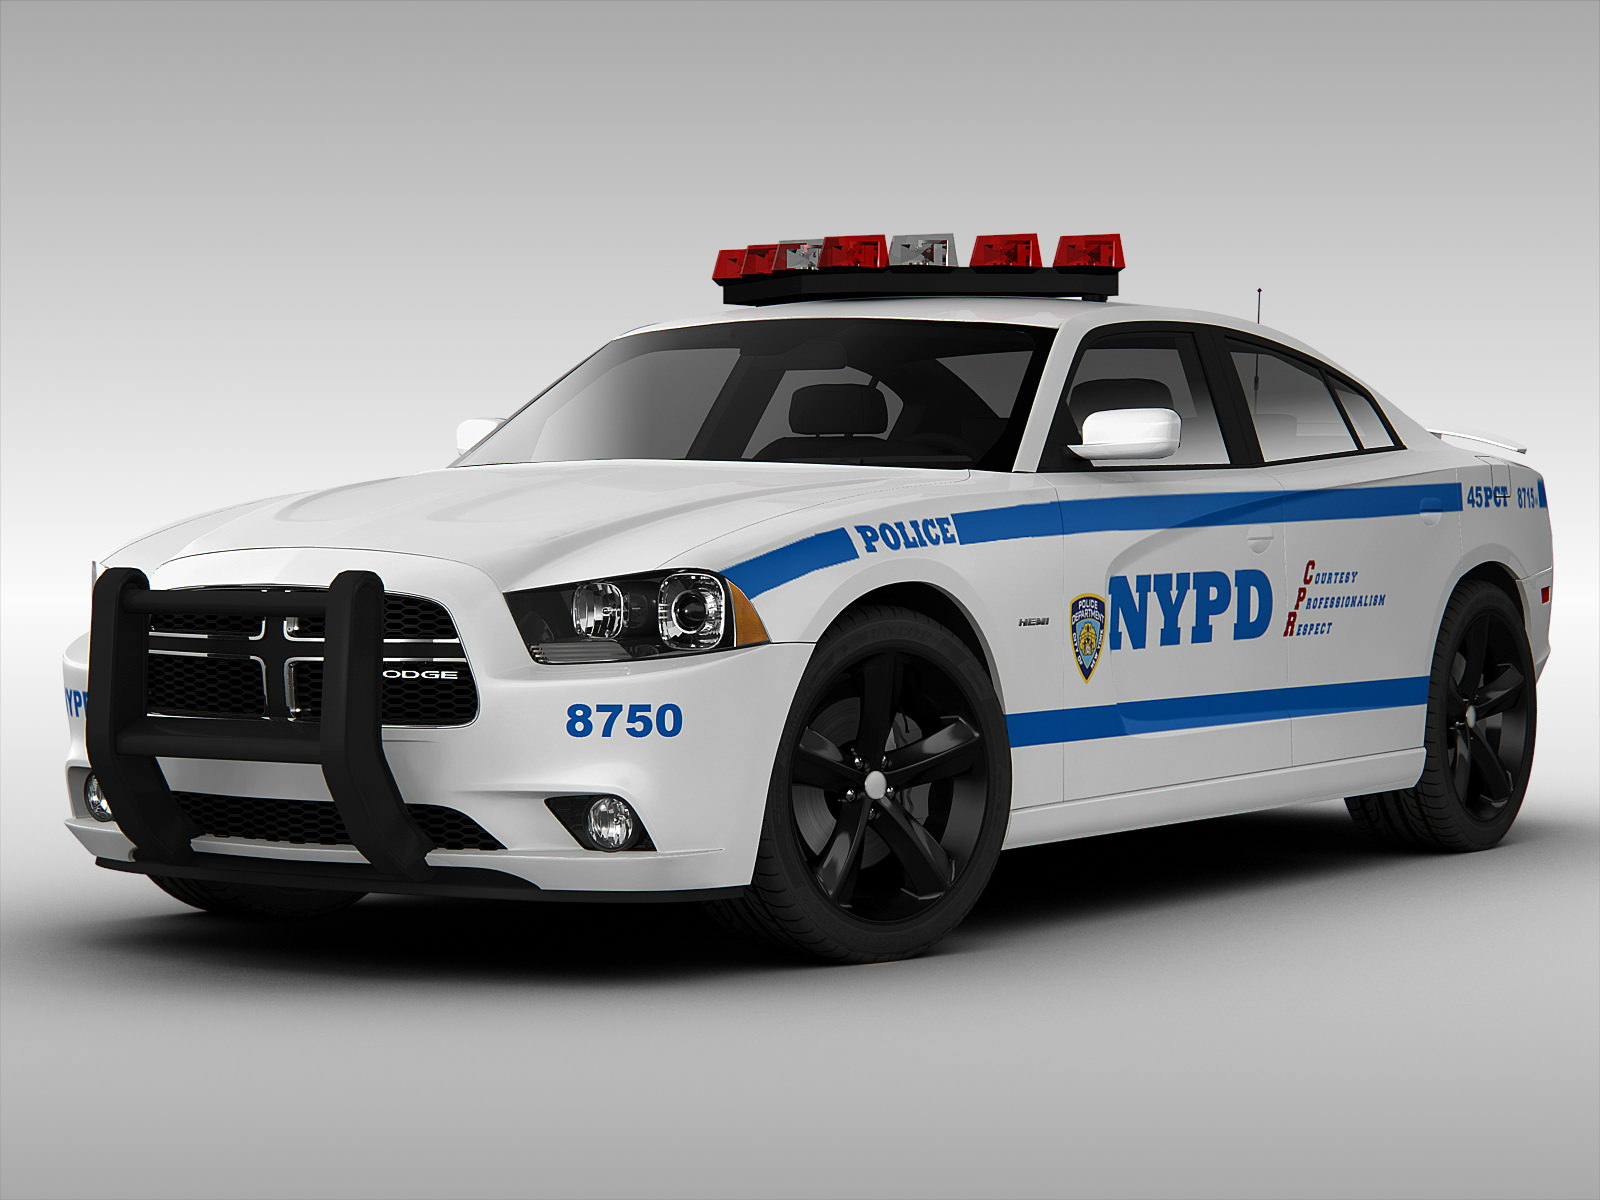 Dodge Charger NYPD Police Car 2013 3D Model MAX OBJ 3DS FBX | CGTrader.com